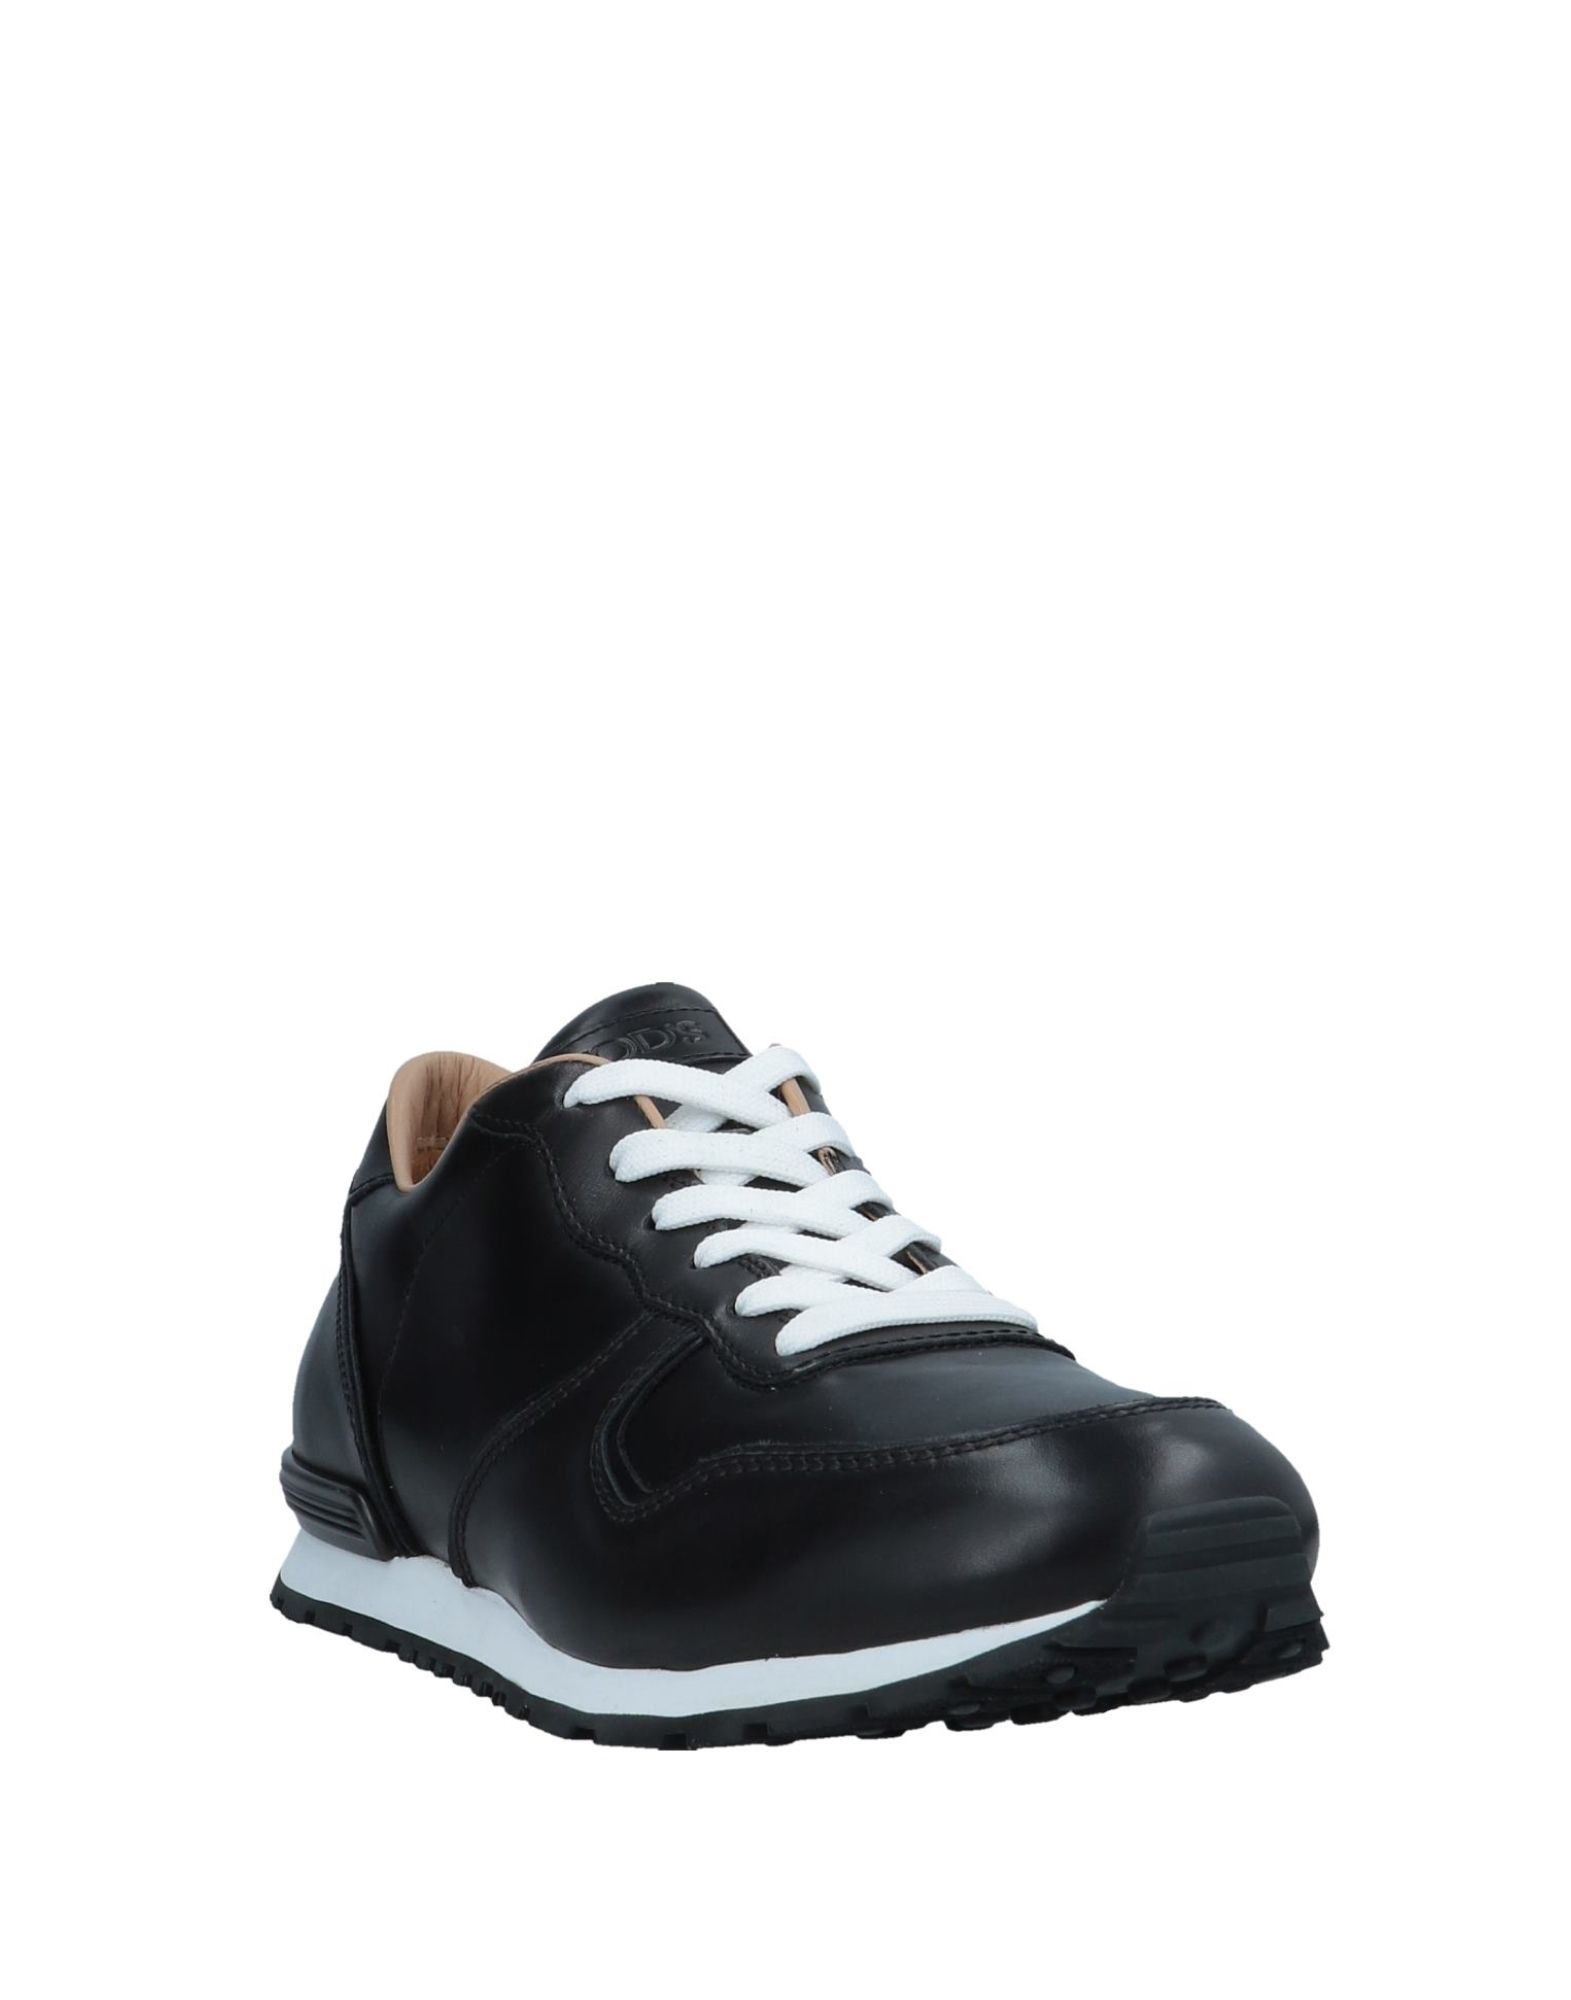 Tod's Sneakers Herren  beliebte 11560748GA Gute Qualität beliebte  Schuhe bc3a92